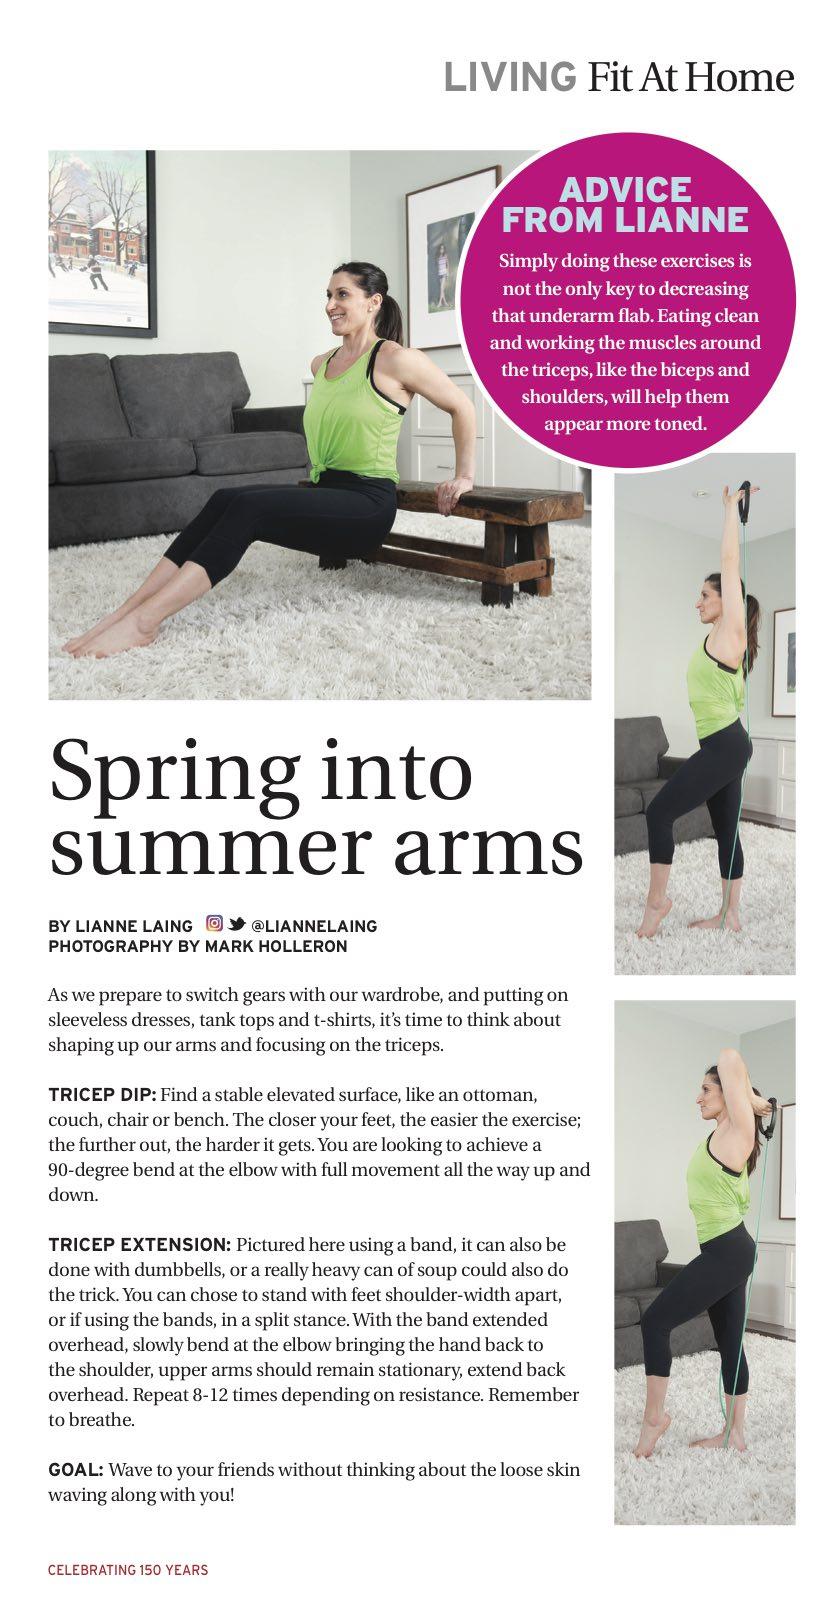 Spring into summer arms